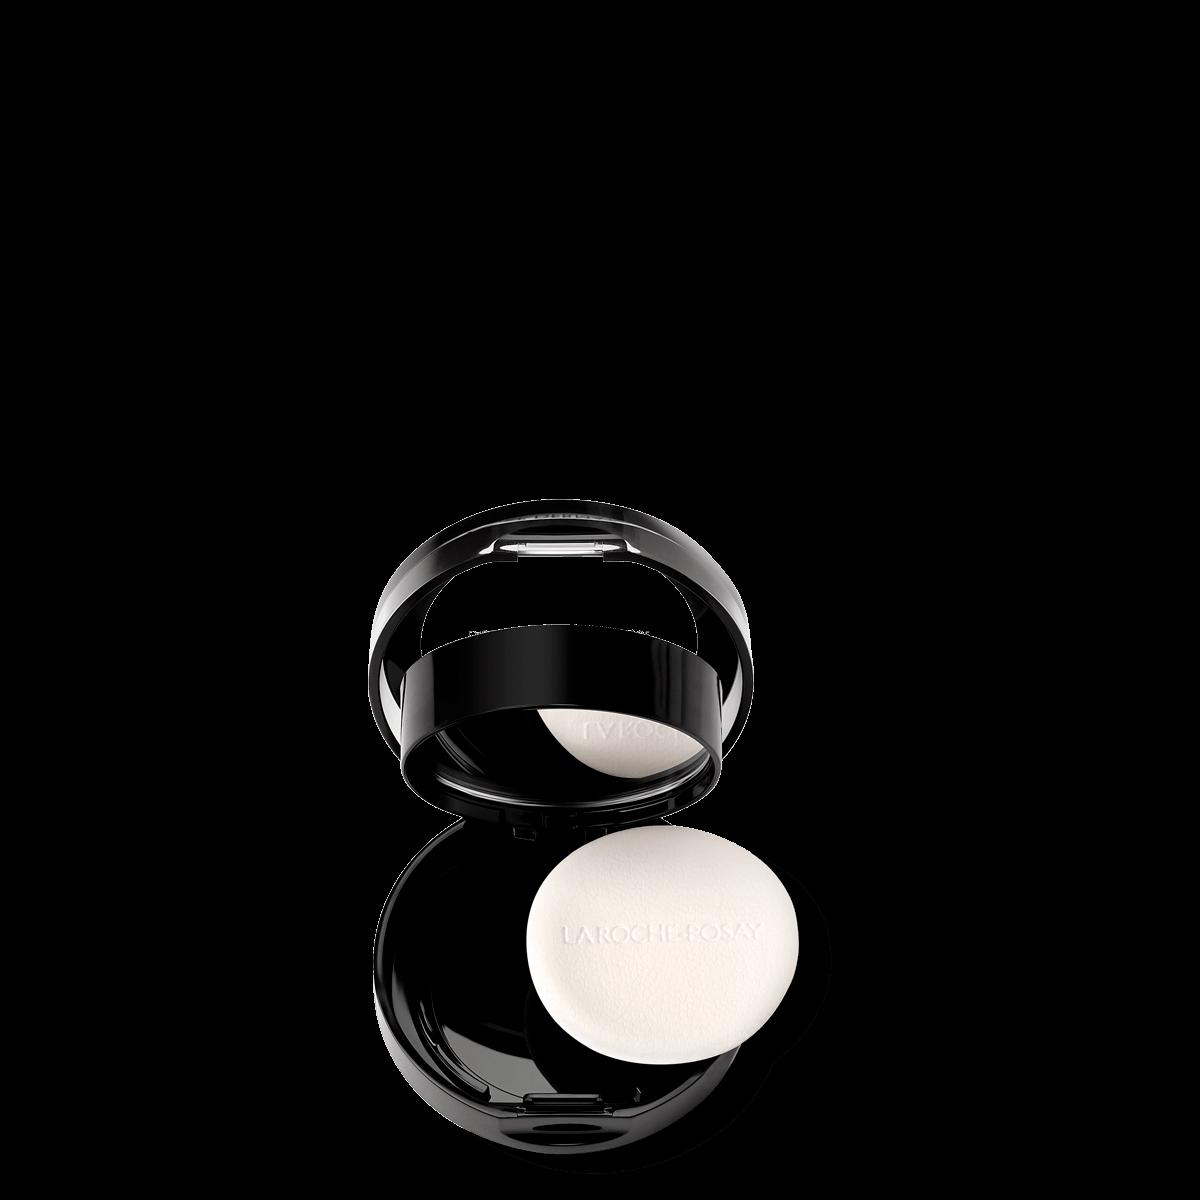 La Roche Posay Sensitive Toleriane Make up BLUSH GoldenPink 30102415 O